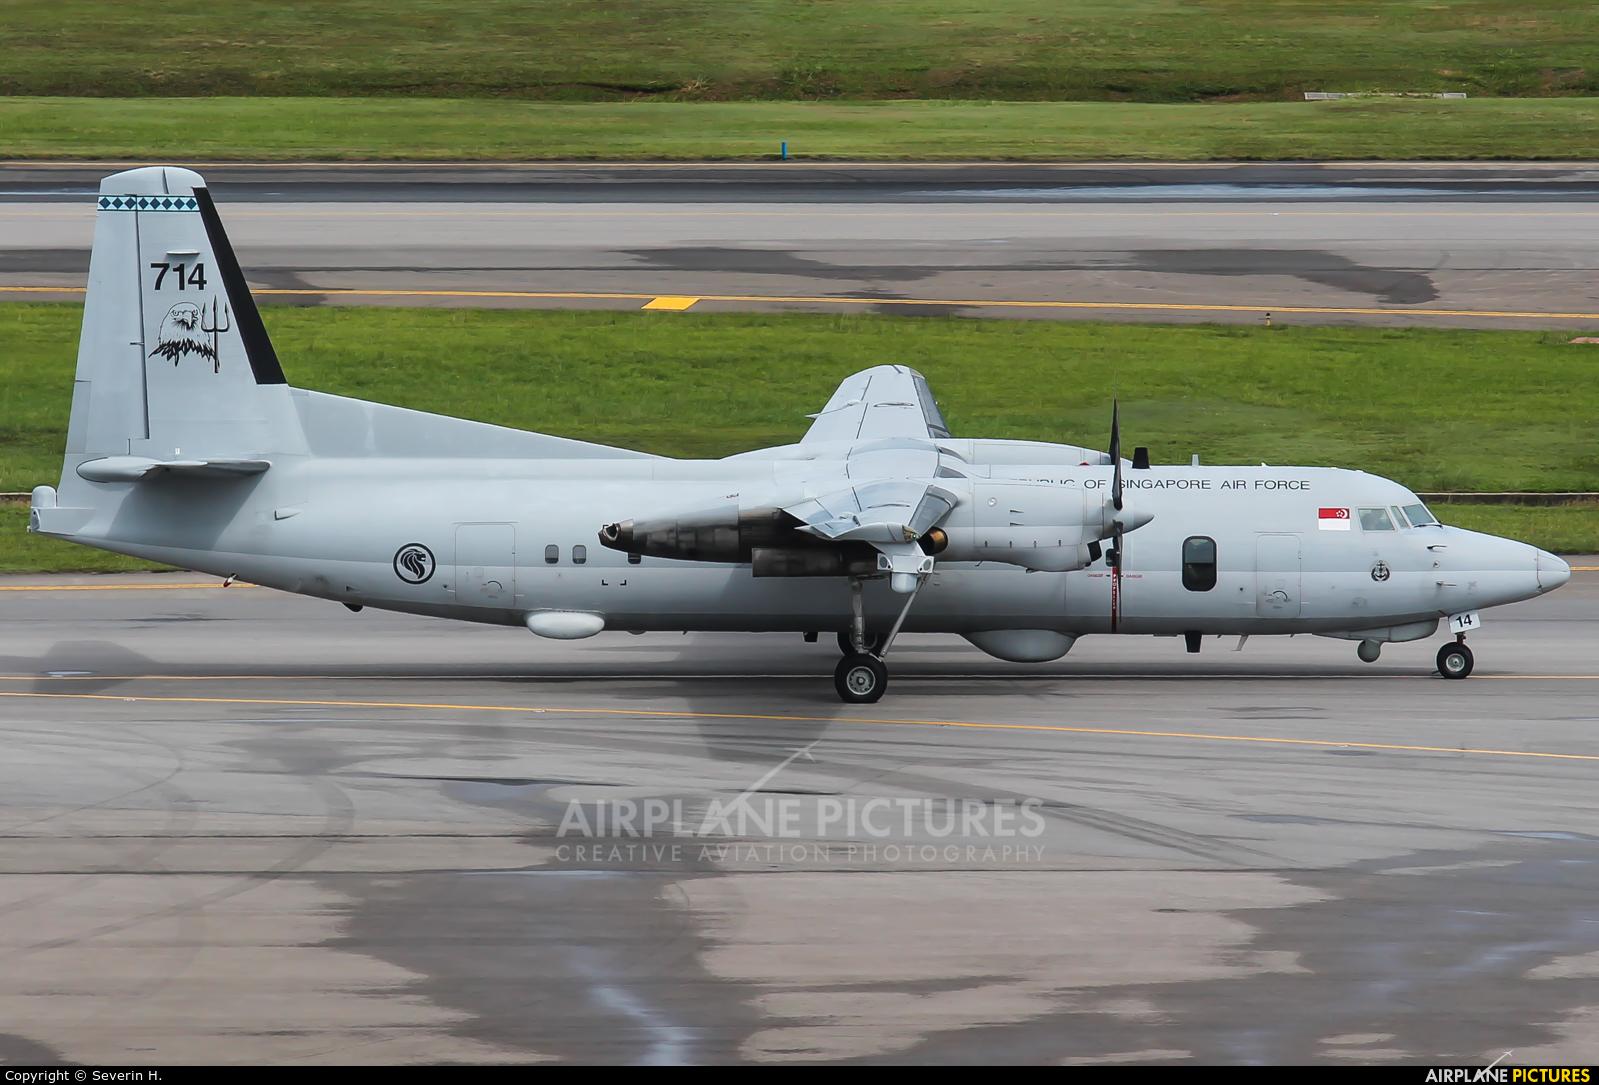 Singapore - Air Force 714 aircraft at Singapore - Changi